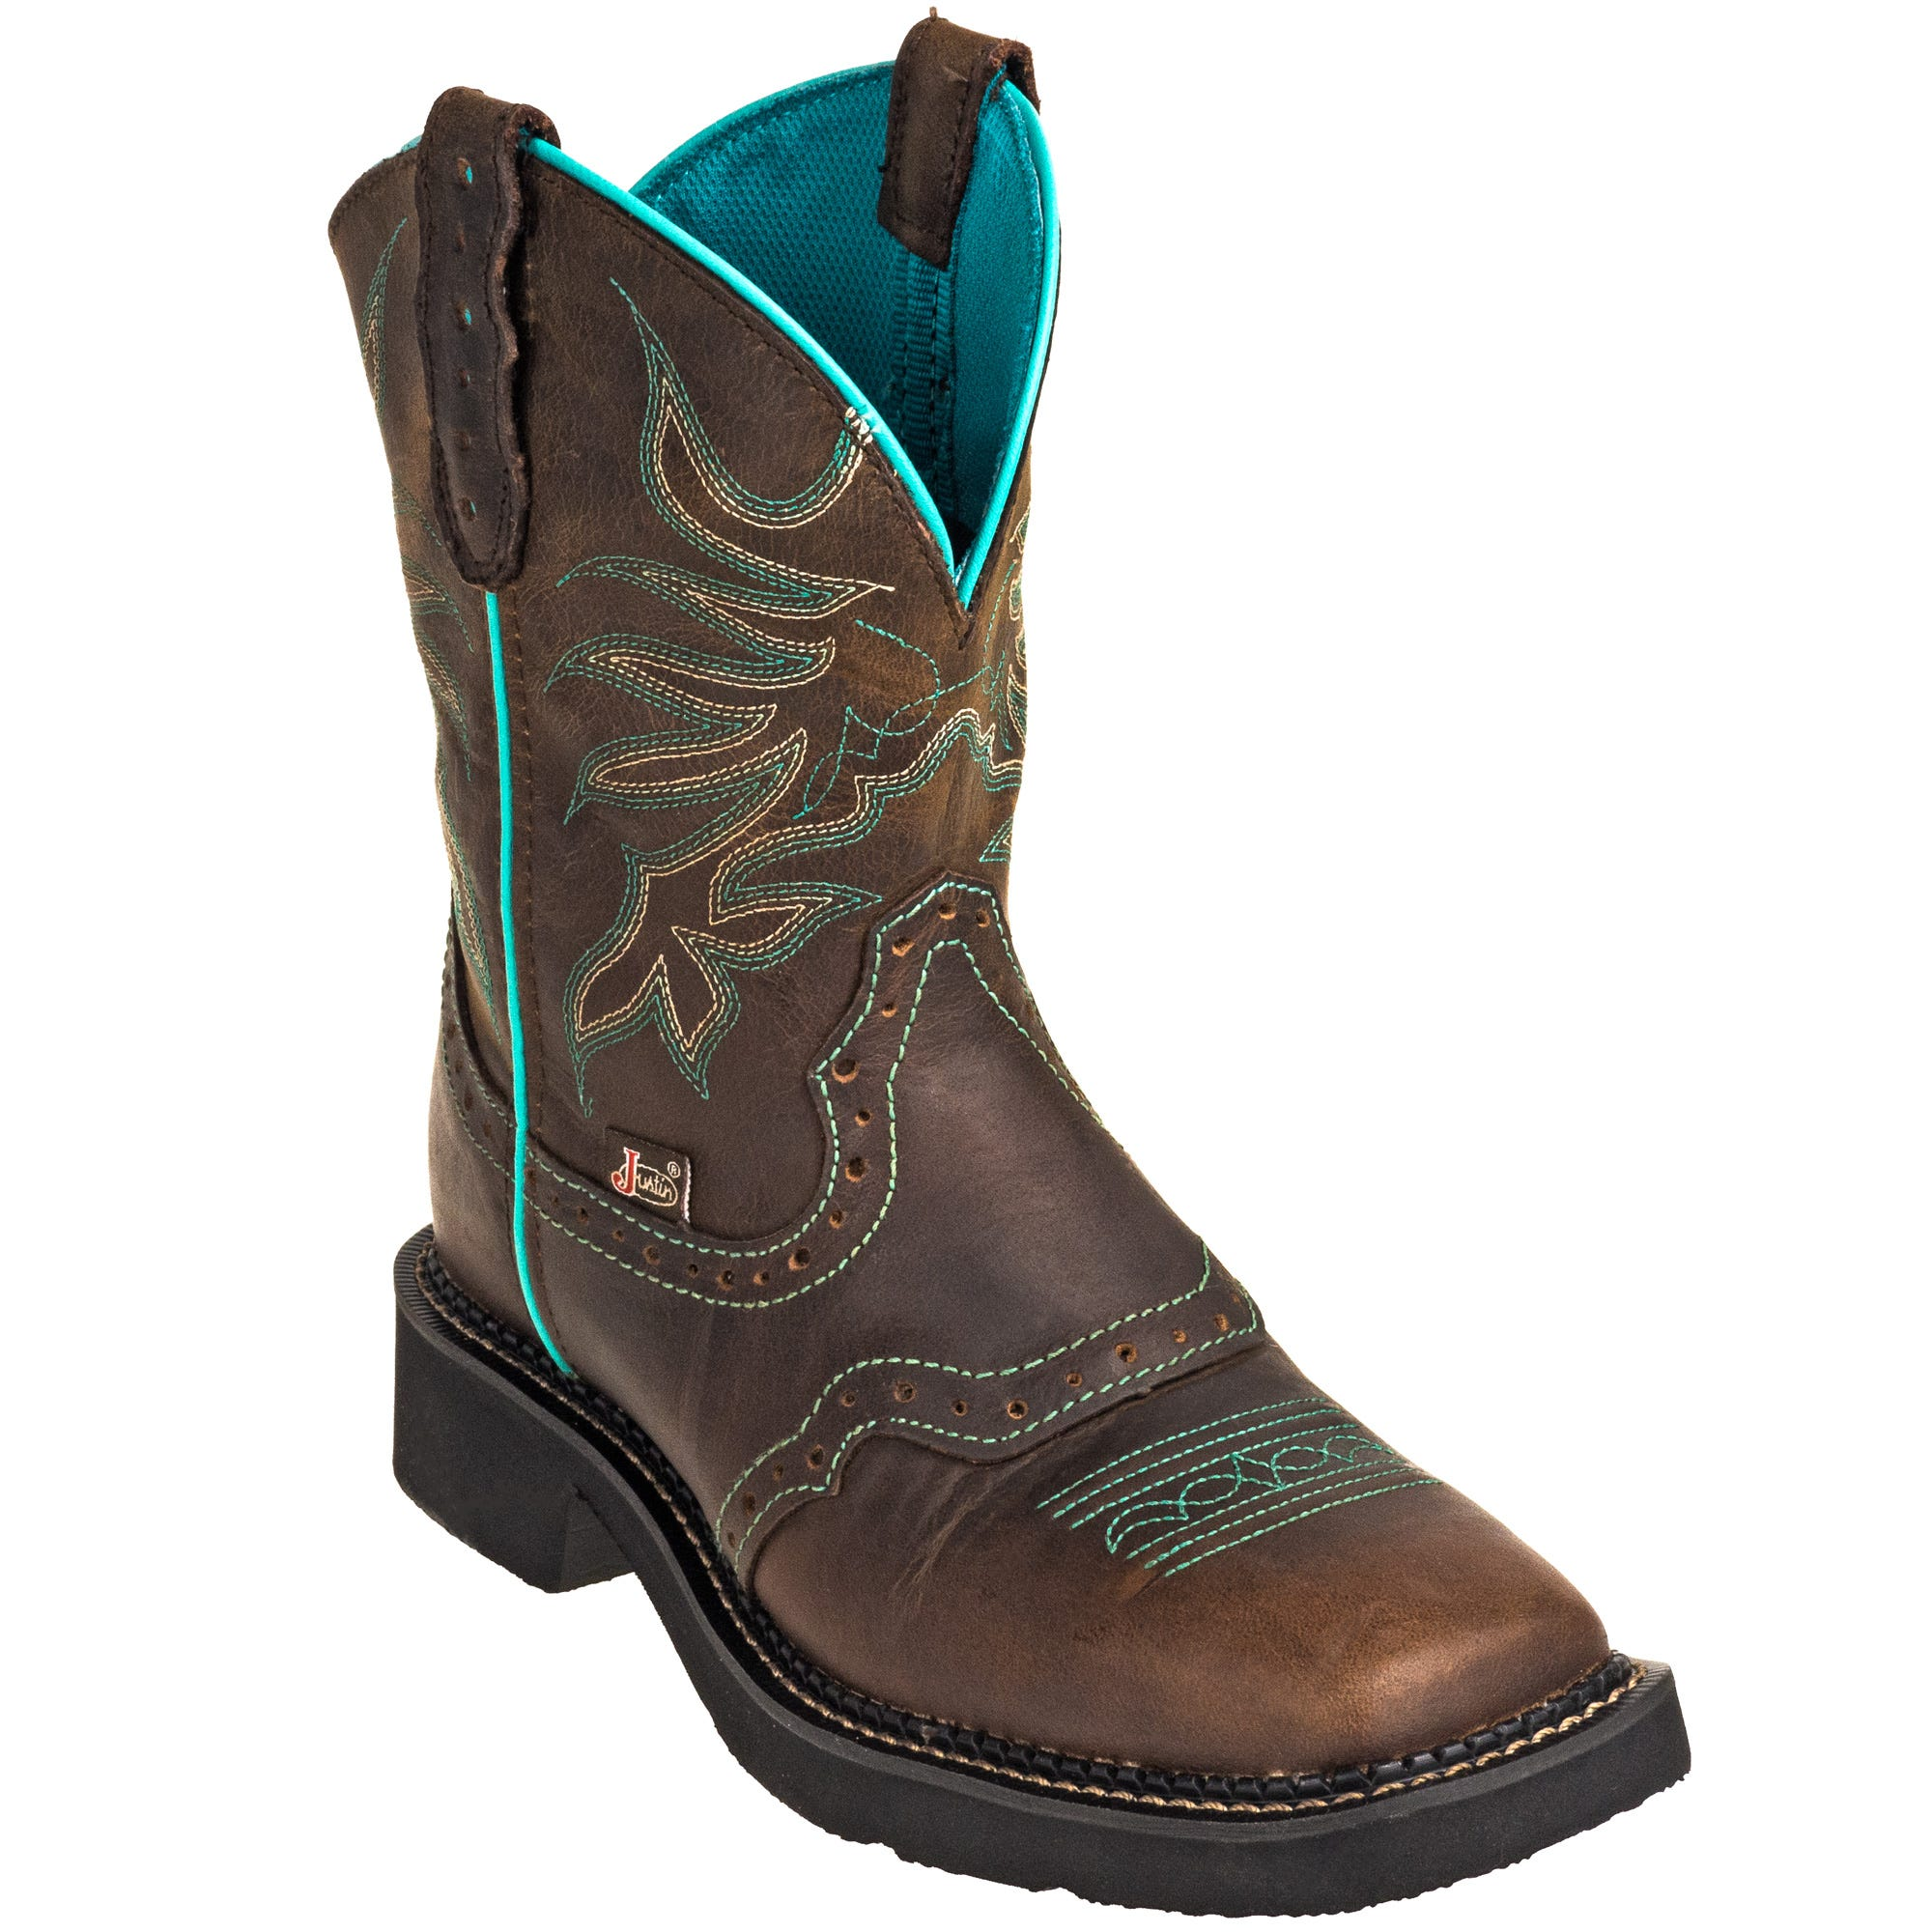 Justin Women's L9624 8-Inch Mandra Chocolate Brown Cowboy Boots